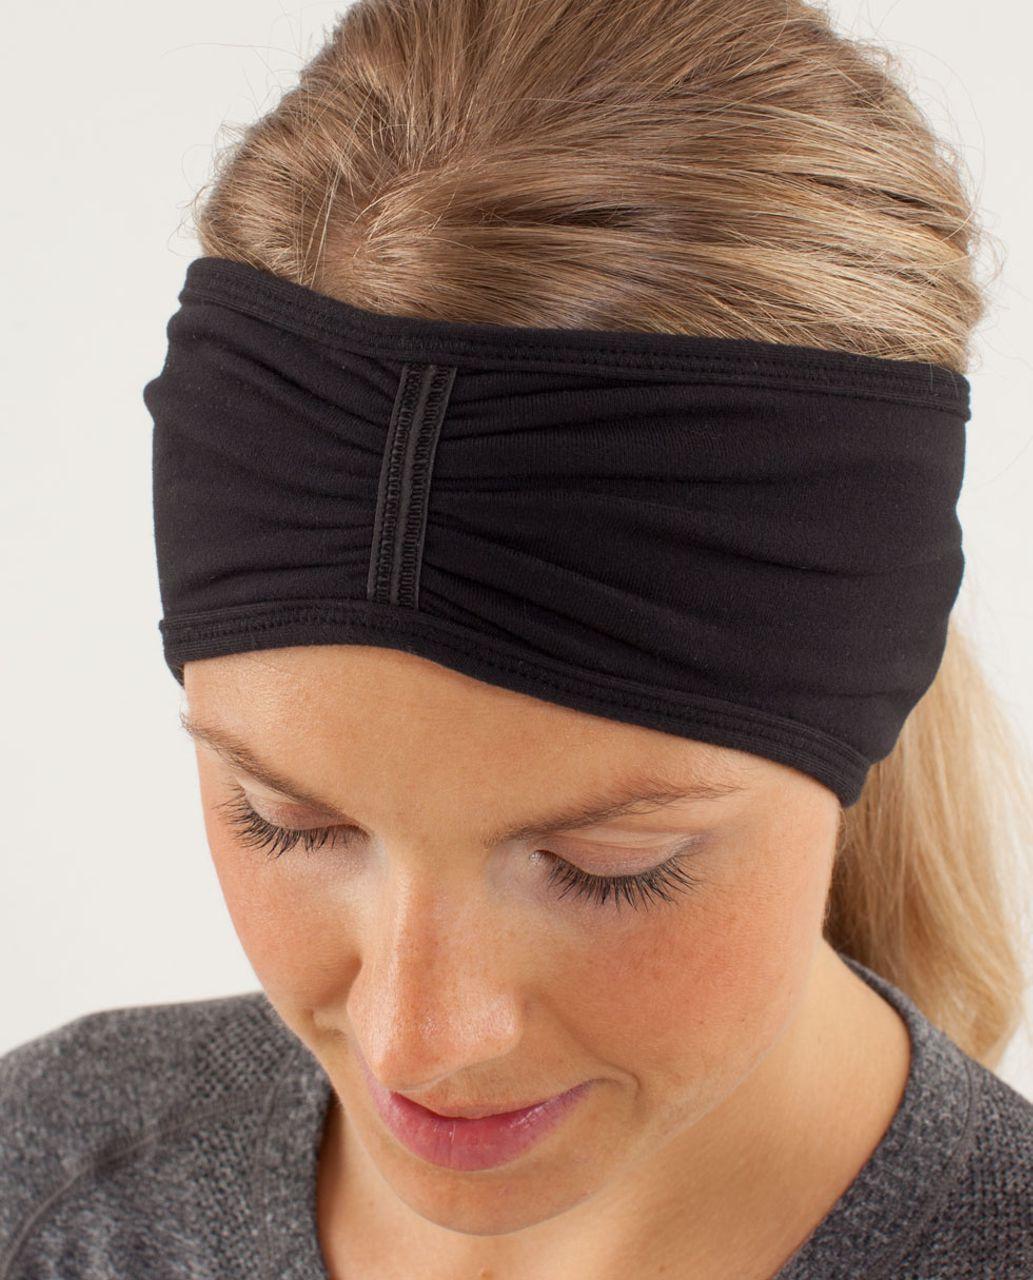 Lululemon Brisk Run Headband - Black / Tonka Stripe Cashew / Heathered Black